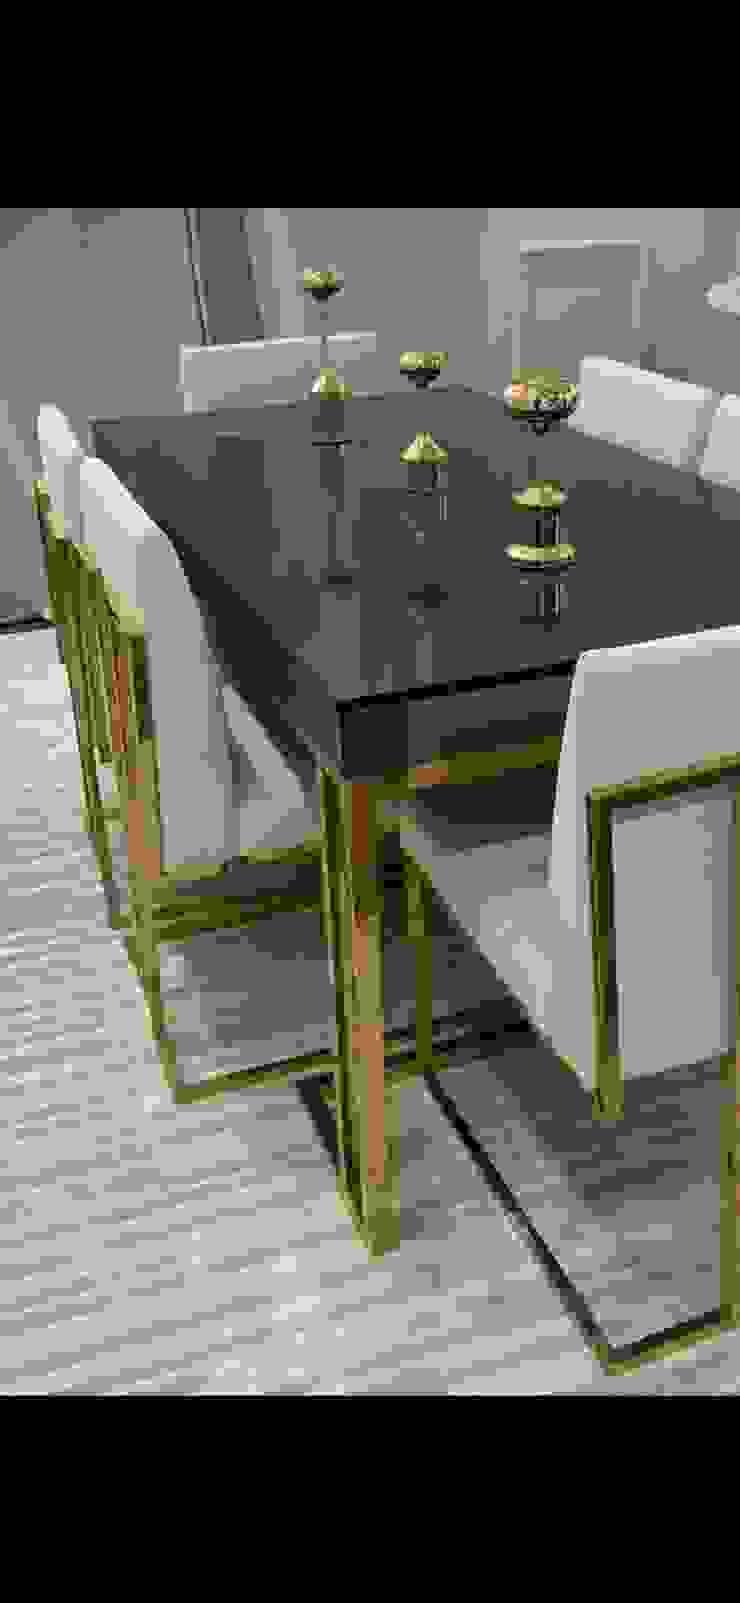 شراء اثاث مستعمل شرق الرياض 0530497714 Balconies, verandas & terraces Accessories & decoration Aluminium/Zinc Metallic/Silver